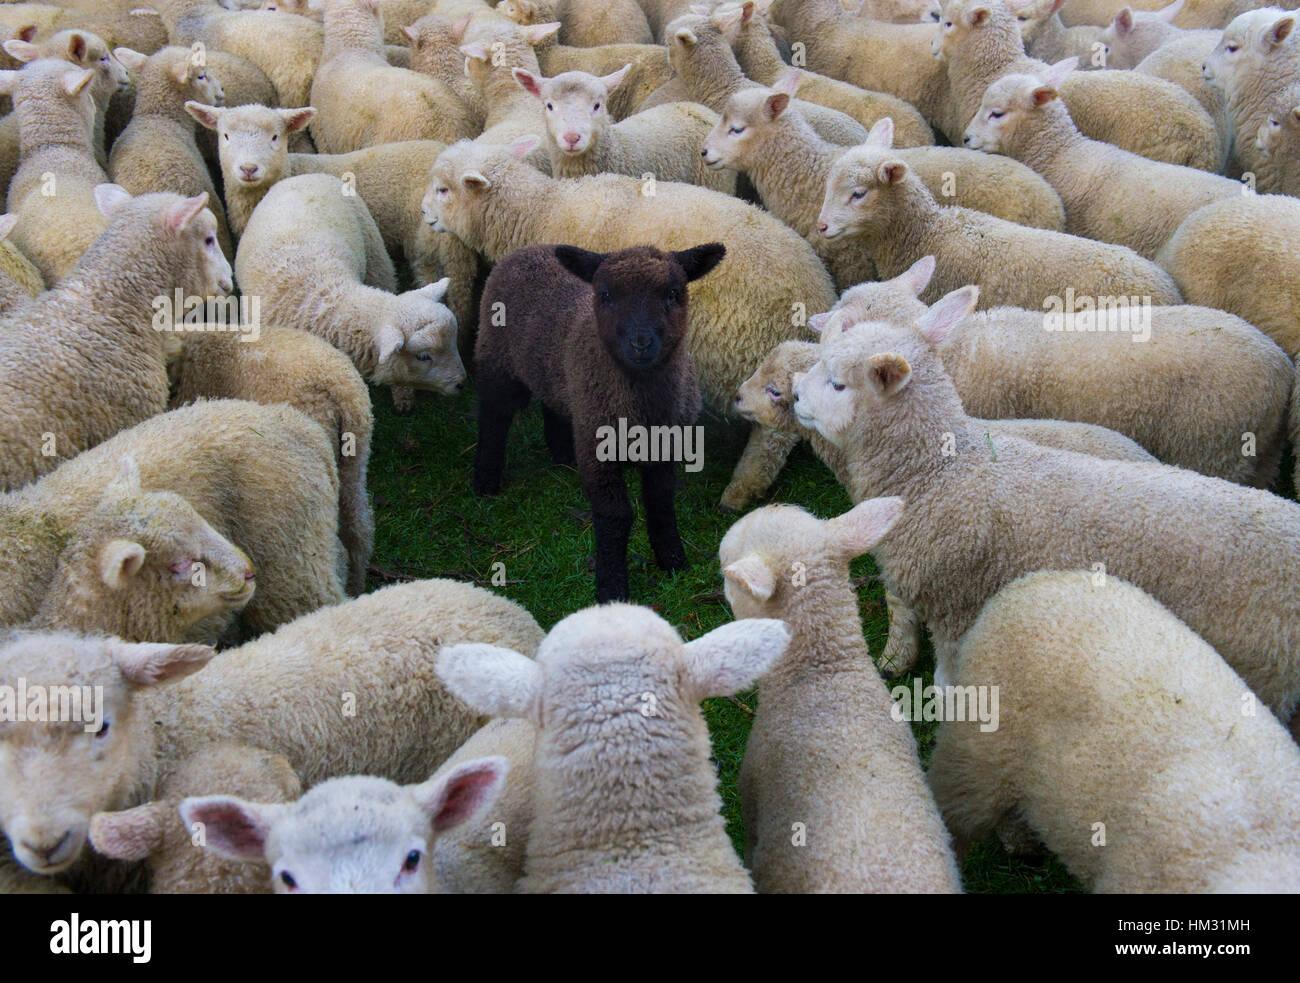 Black sheep of the family Black sheep among white sheep - Stock Image